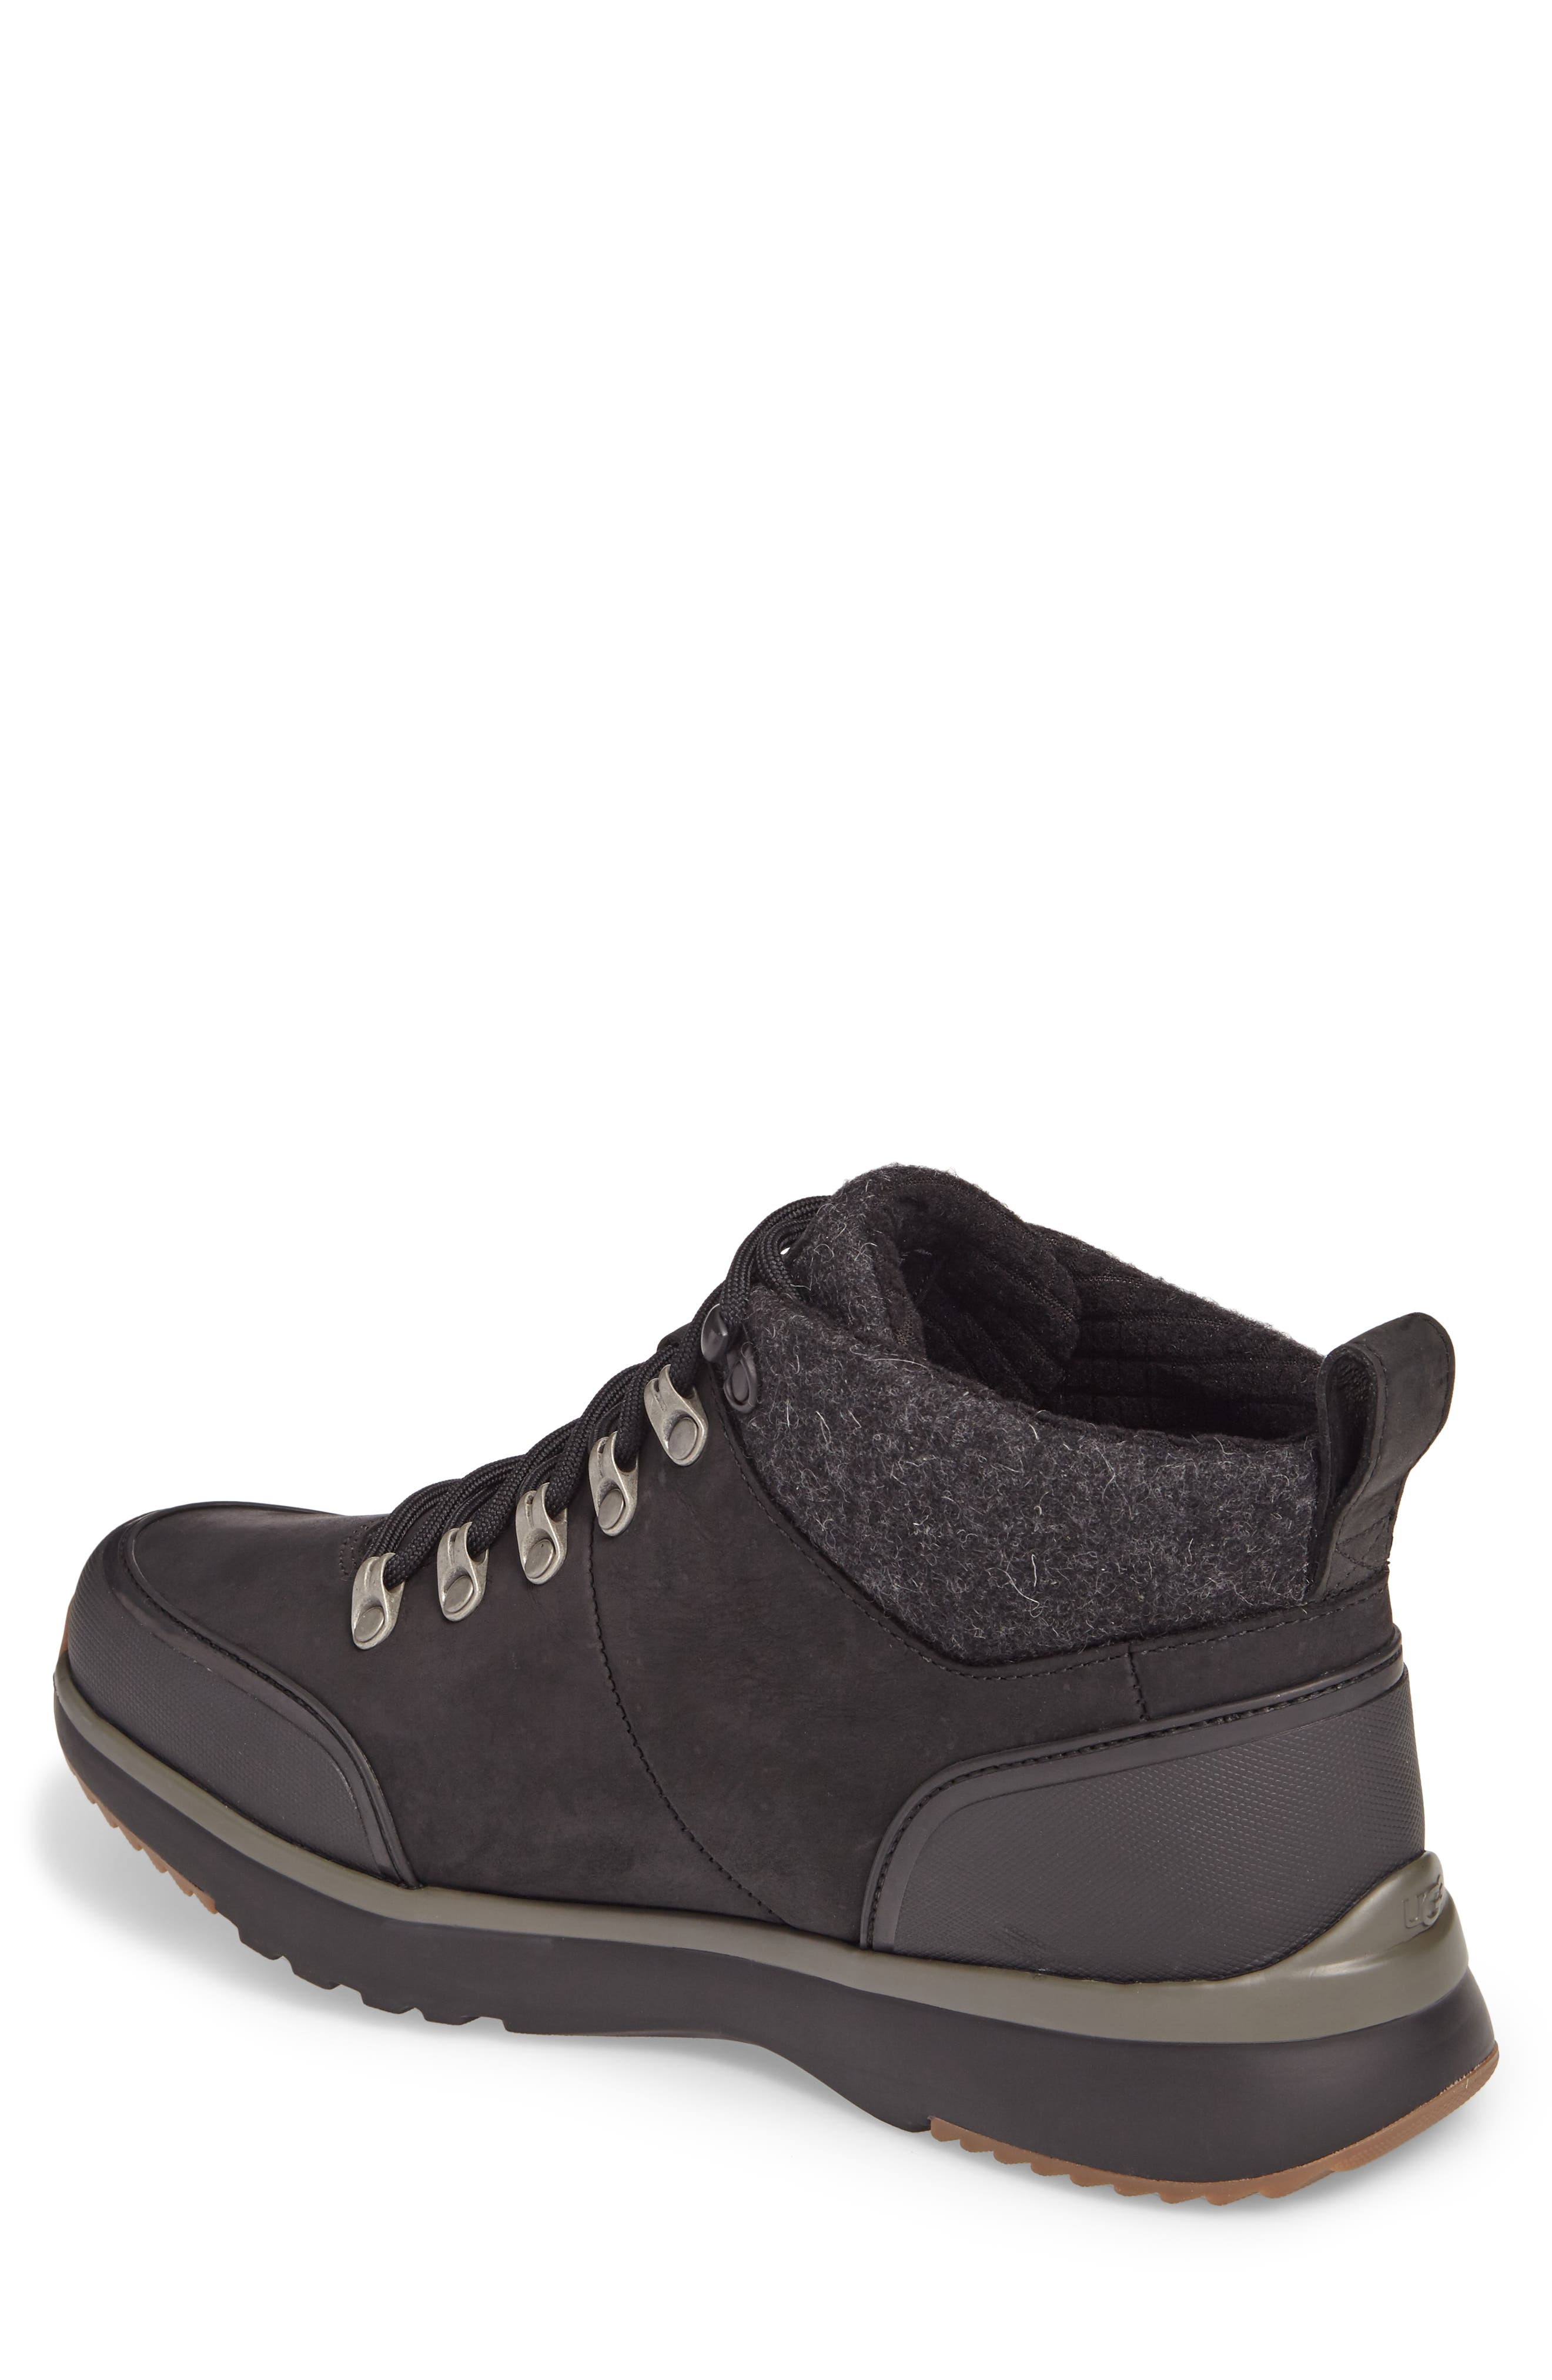 Olivert Hiking Waterproof Boot,                             Alternate thumbnail 2, color,                             BLACK